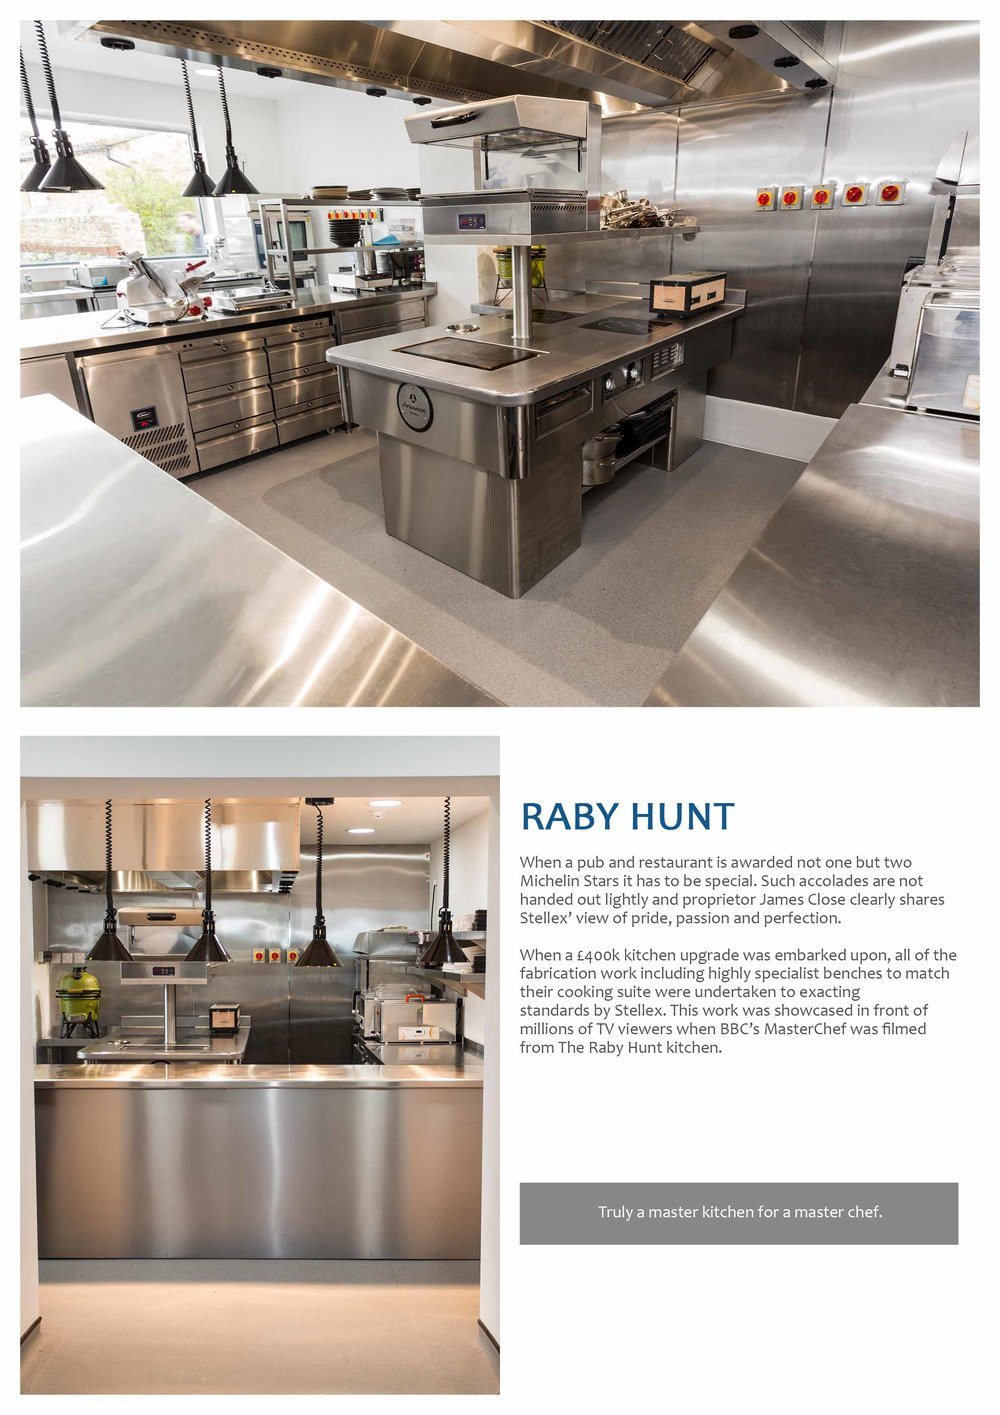 5 Raby Hunt.jpg